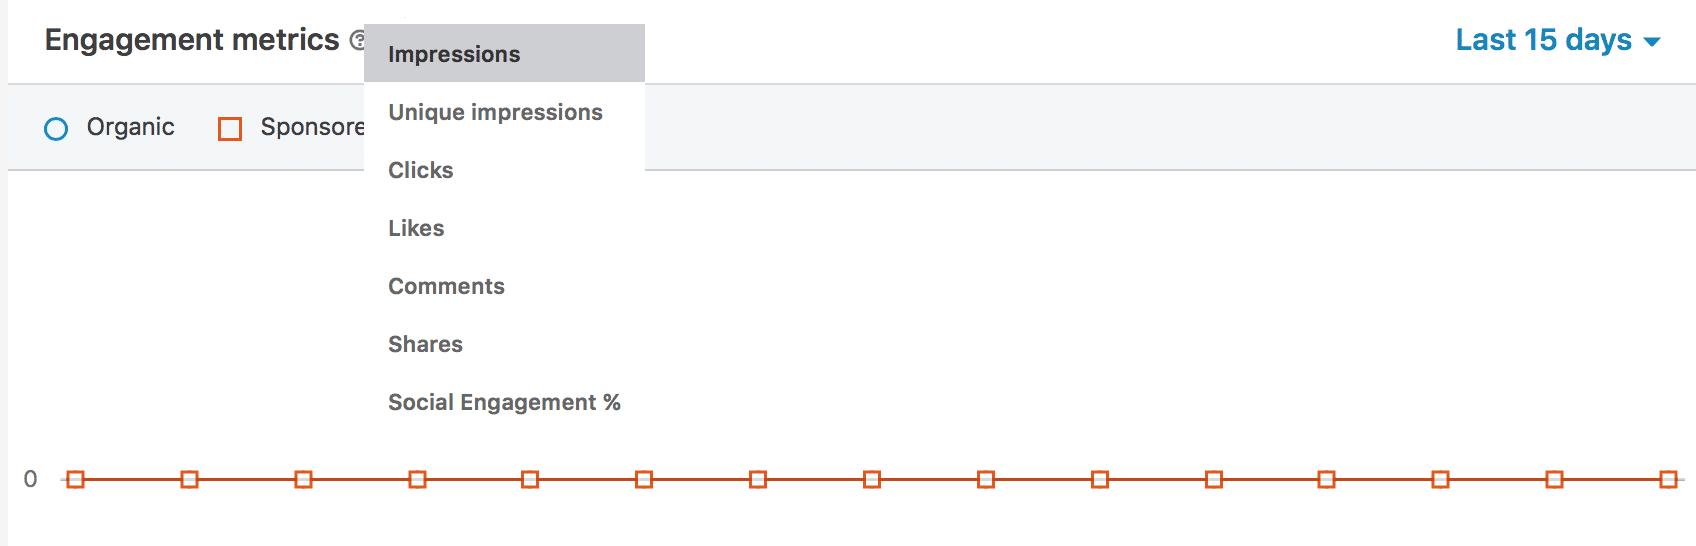 LinkedIn analytics-- engagement metrics